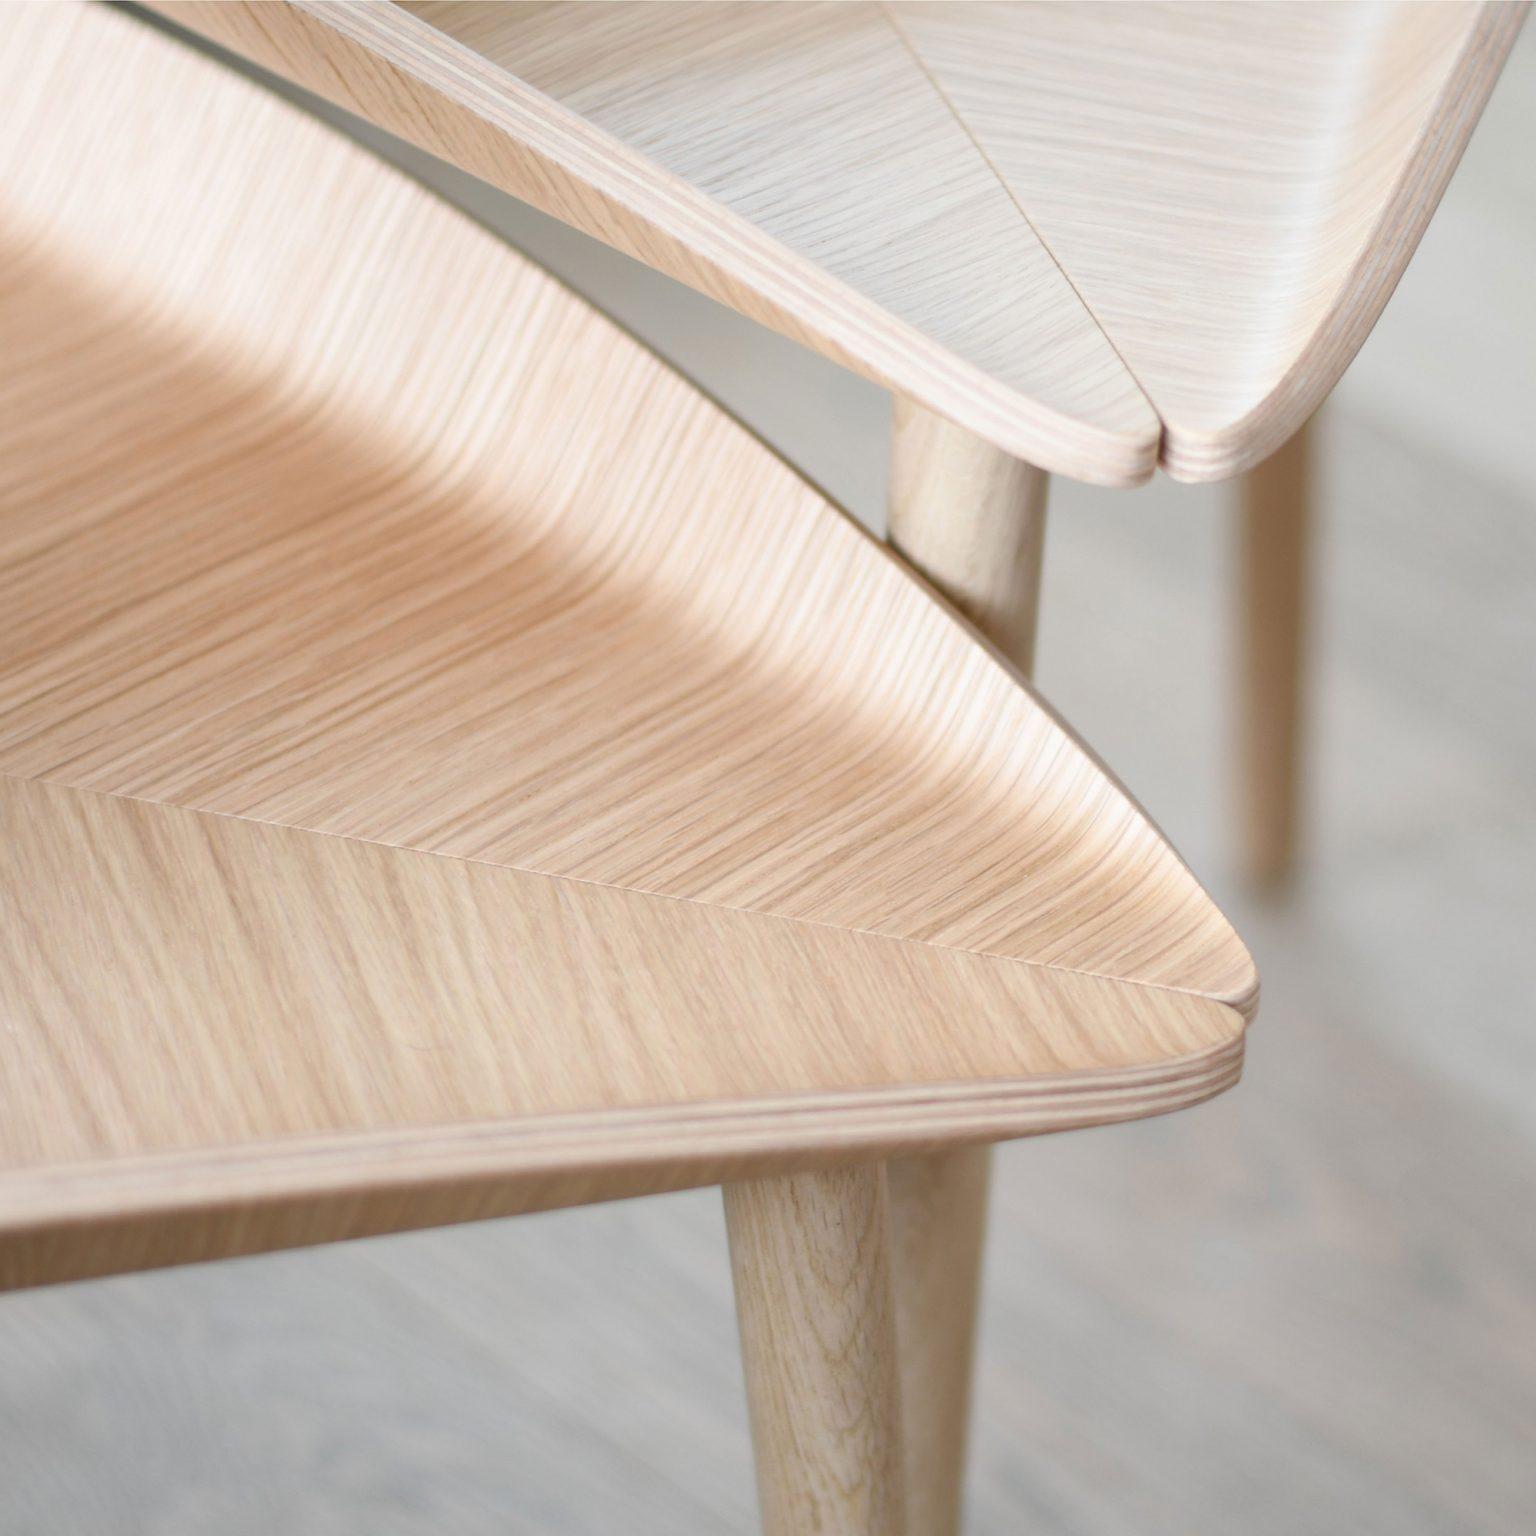 Design coffee table, oak